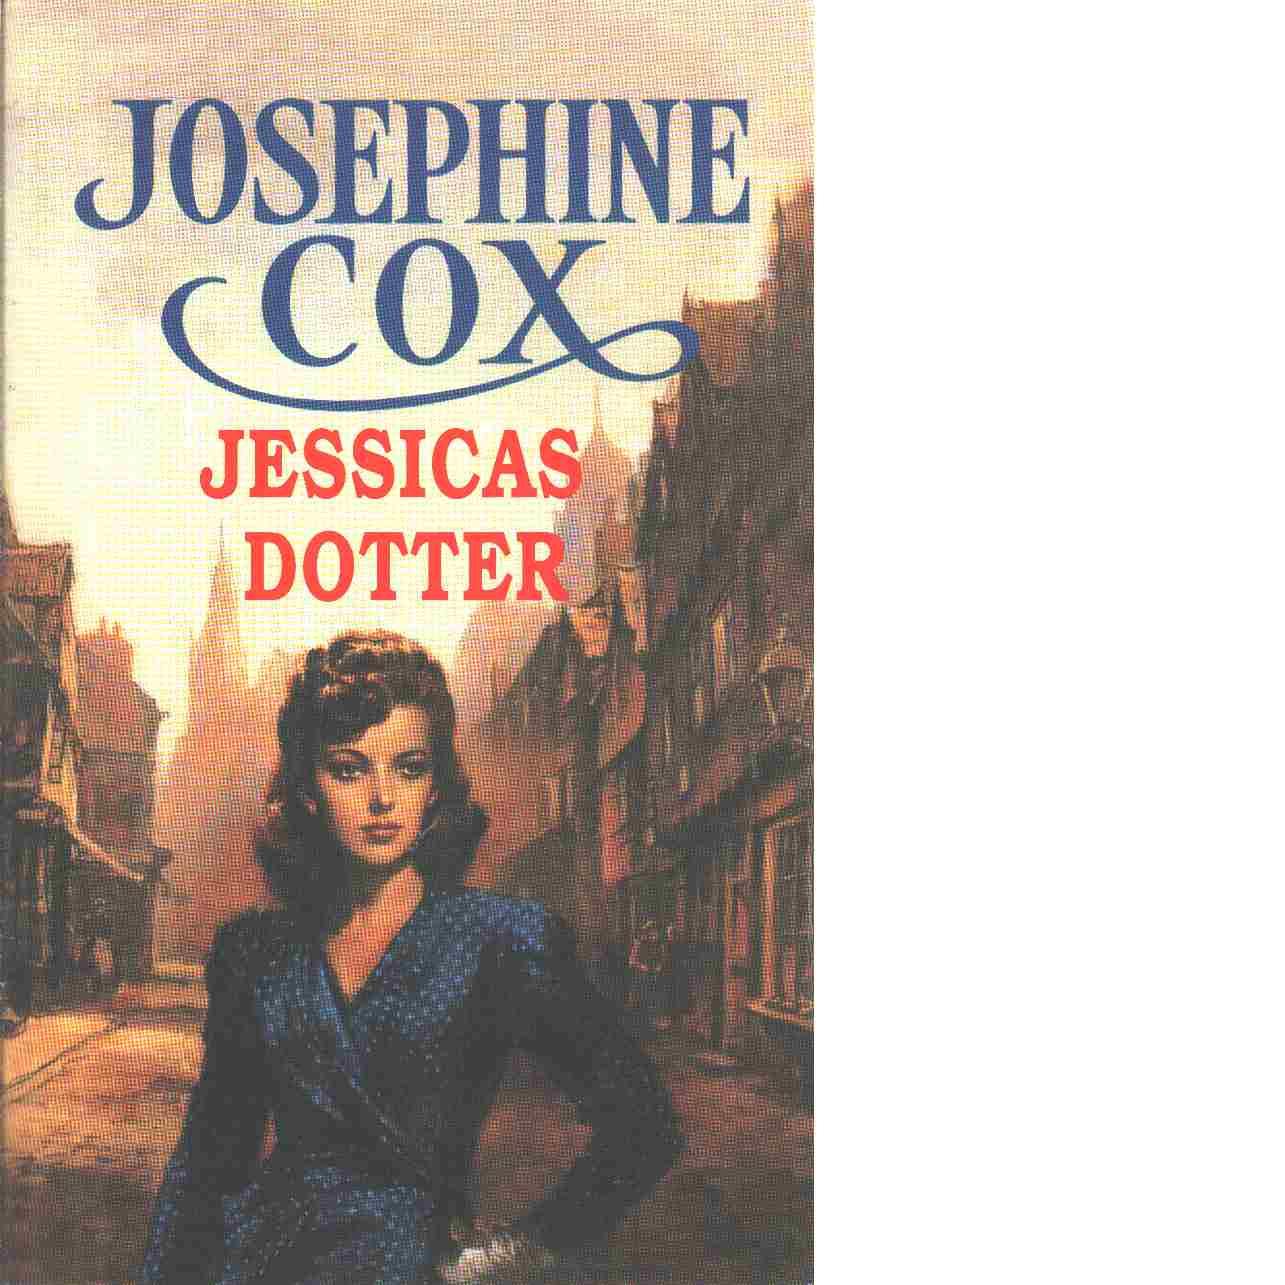 Jessicas dotter - Cox, Josephine